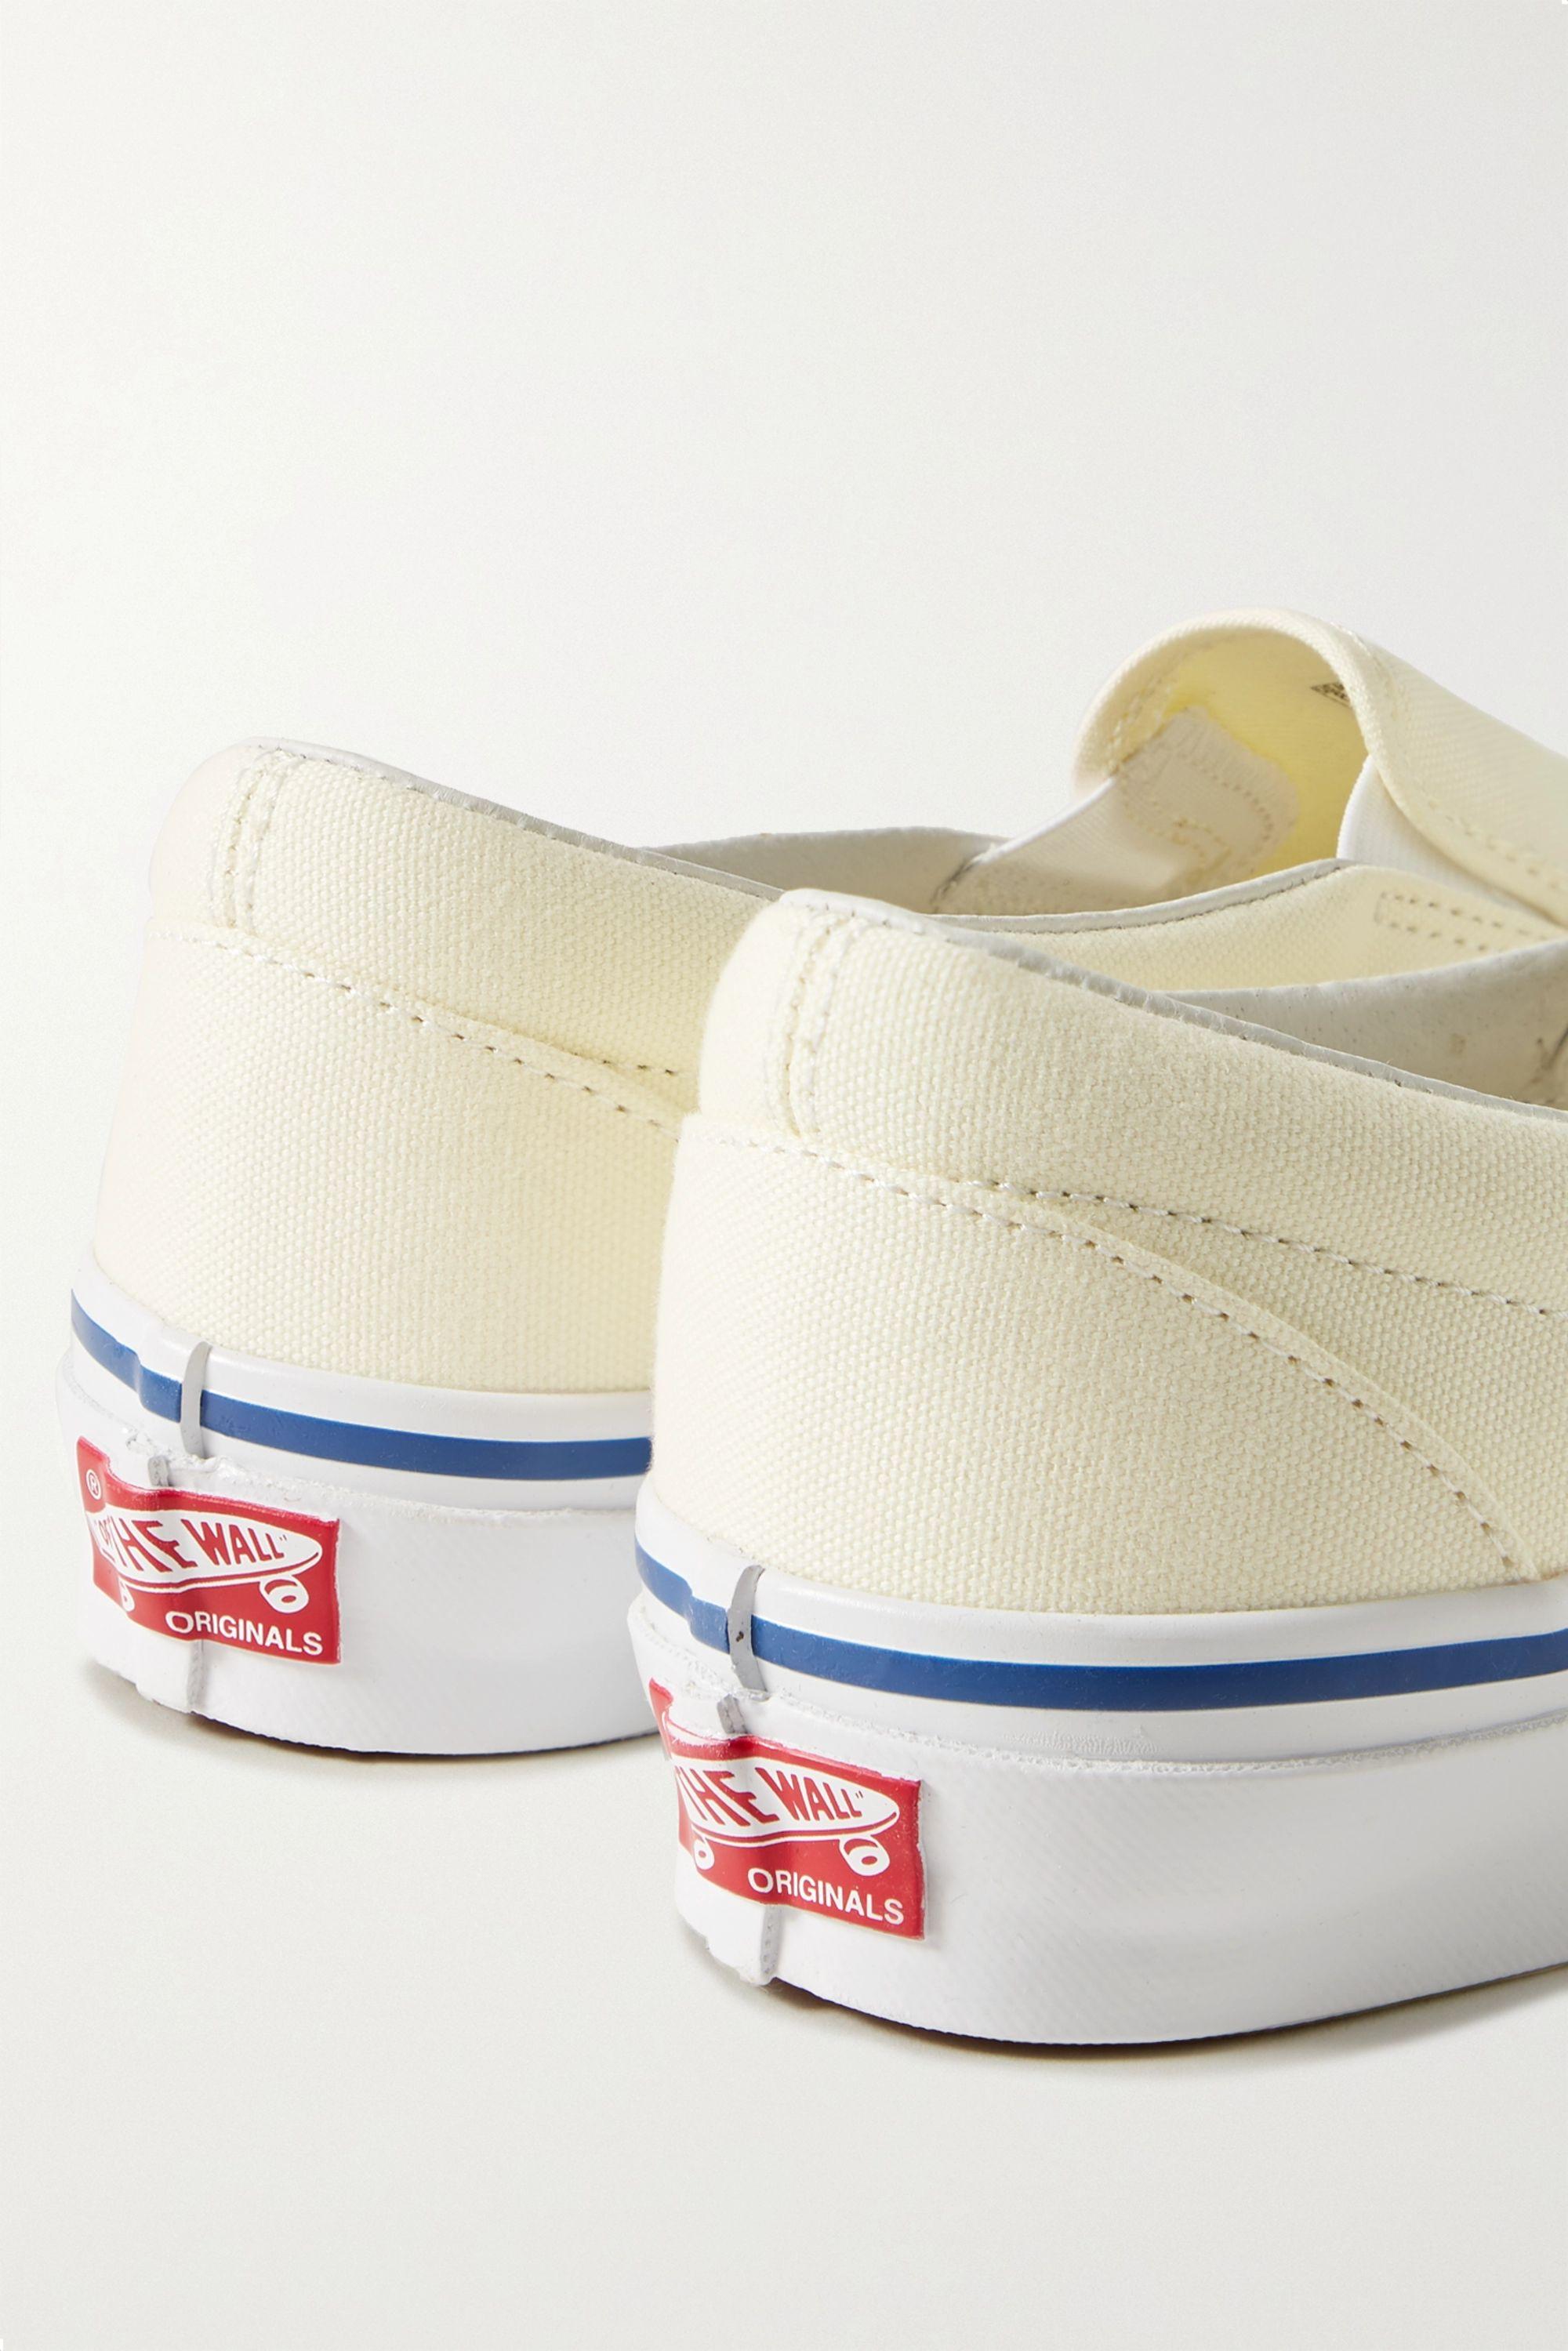 Vans UA OG Classic LX canvas slip-on sneakers